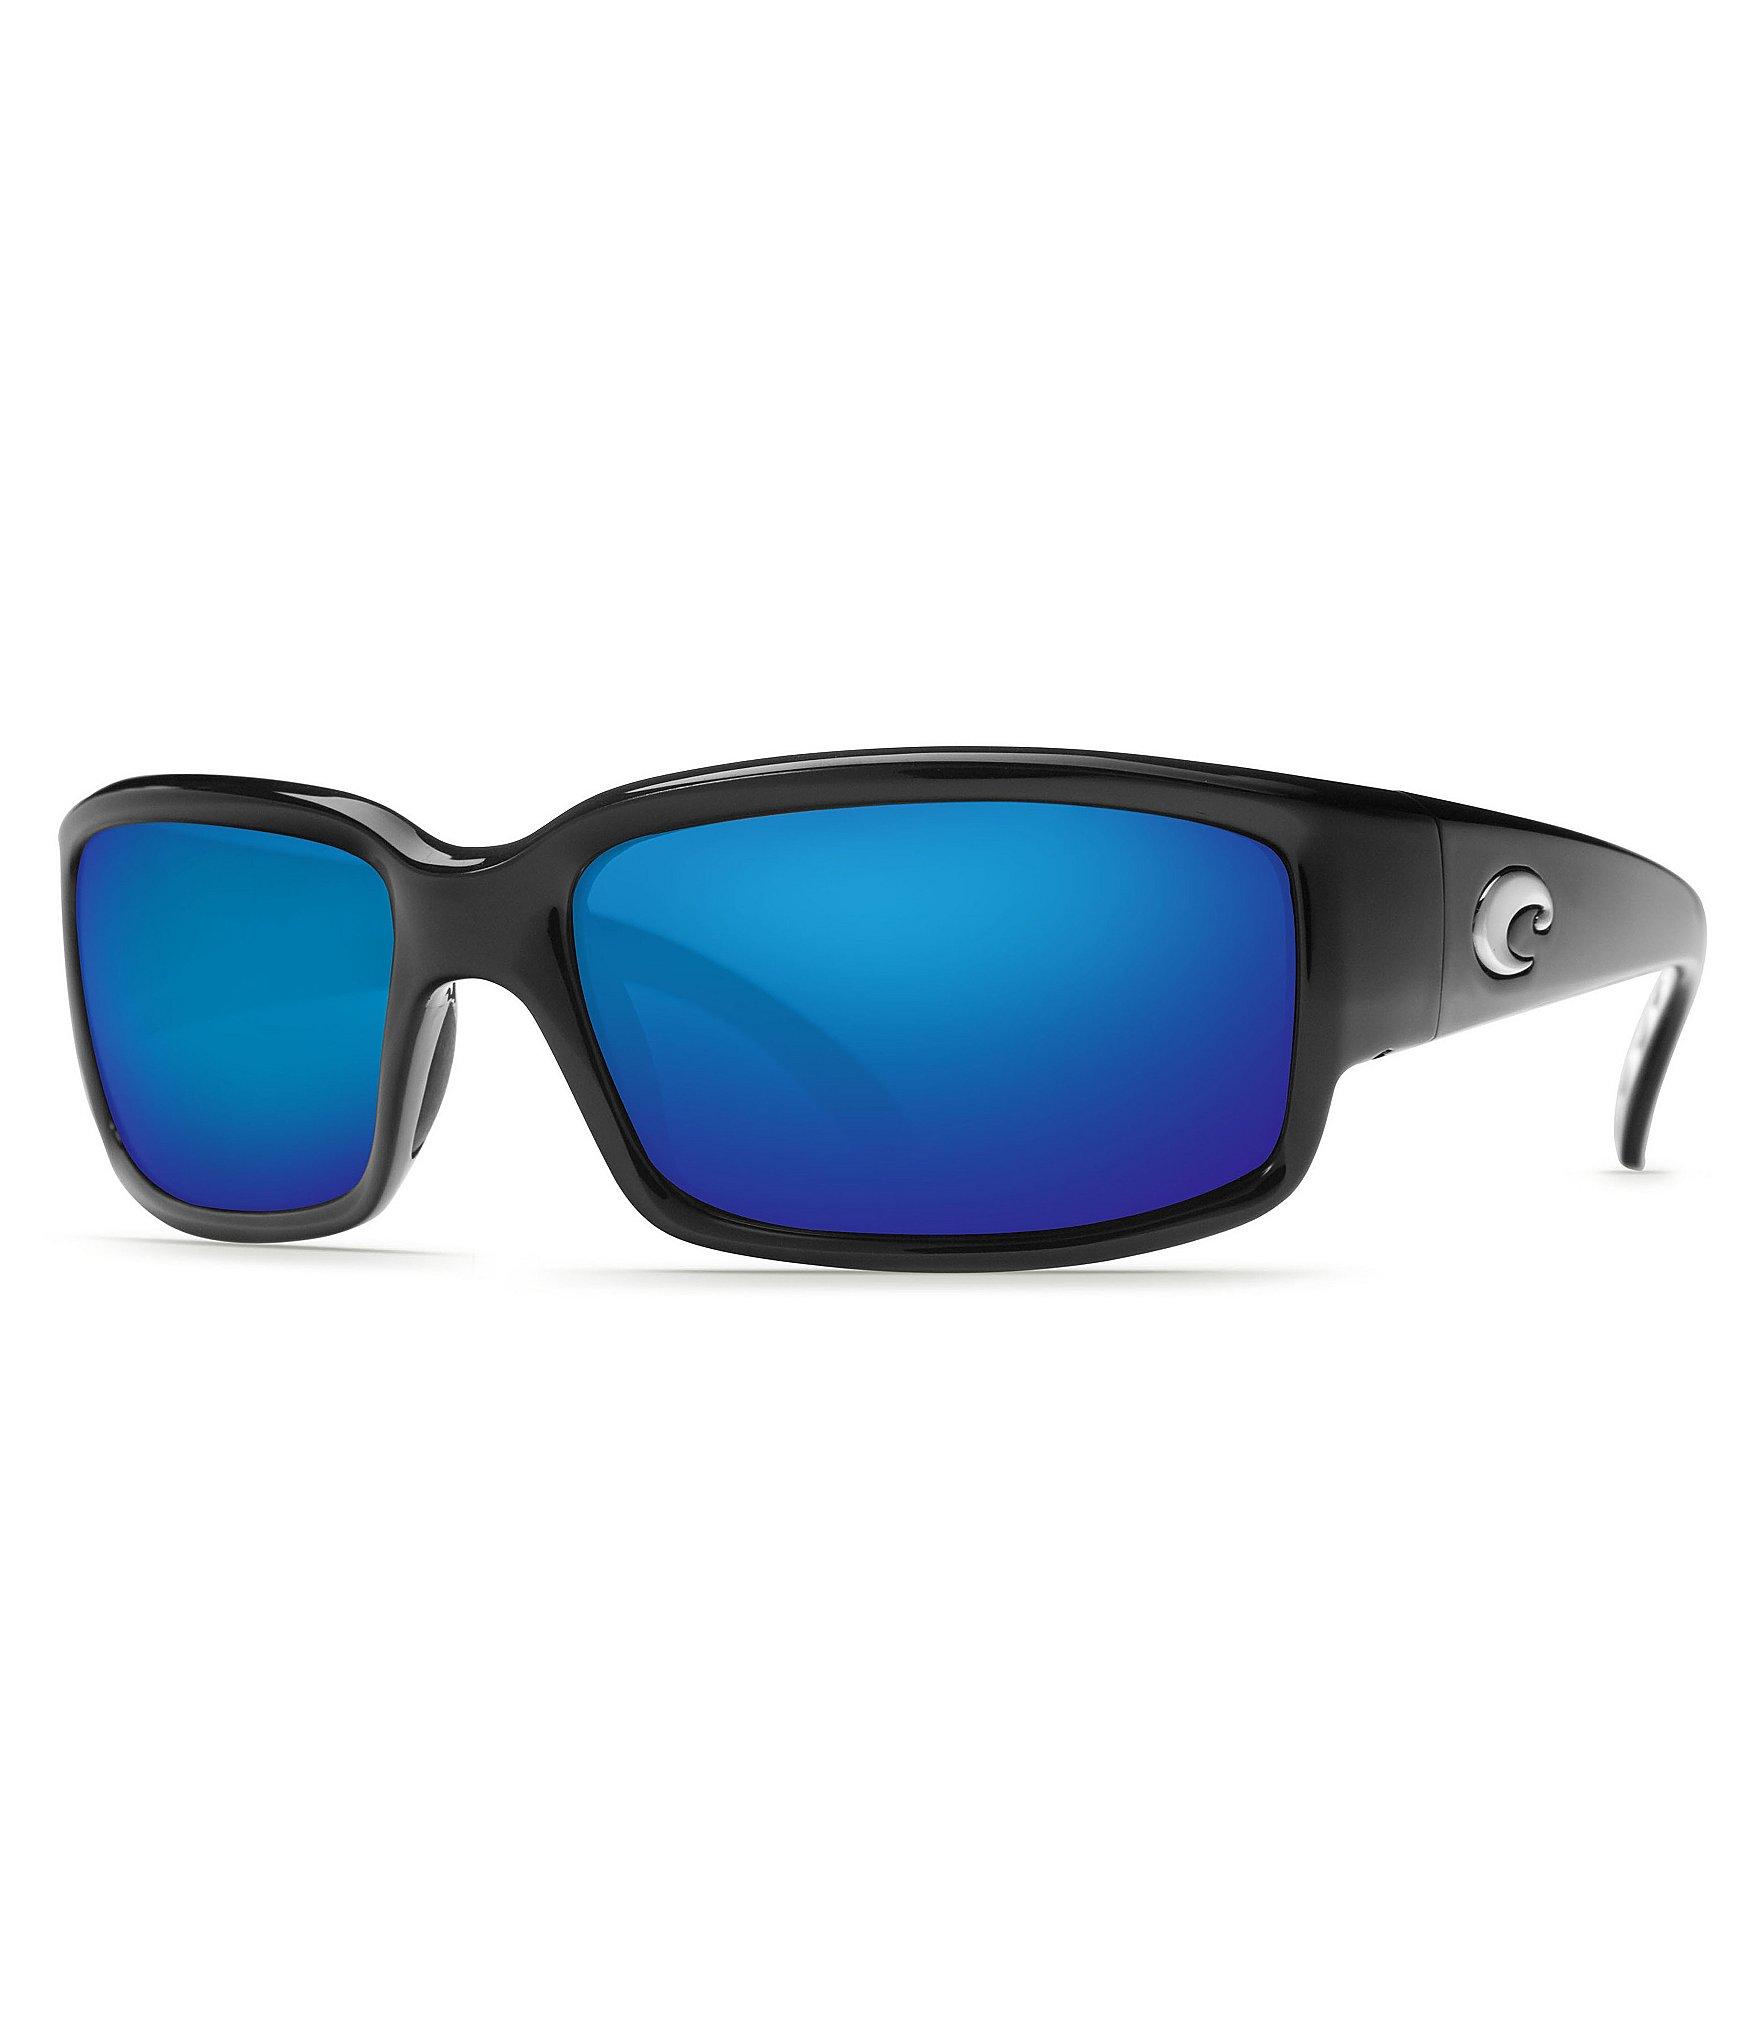 efd943eb9d4ca Costa Women s Sunglasses   Eyewear